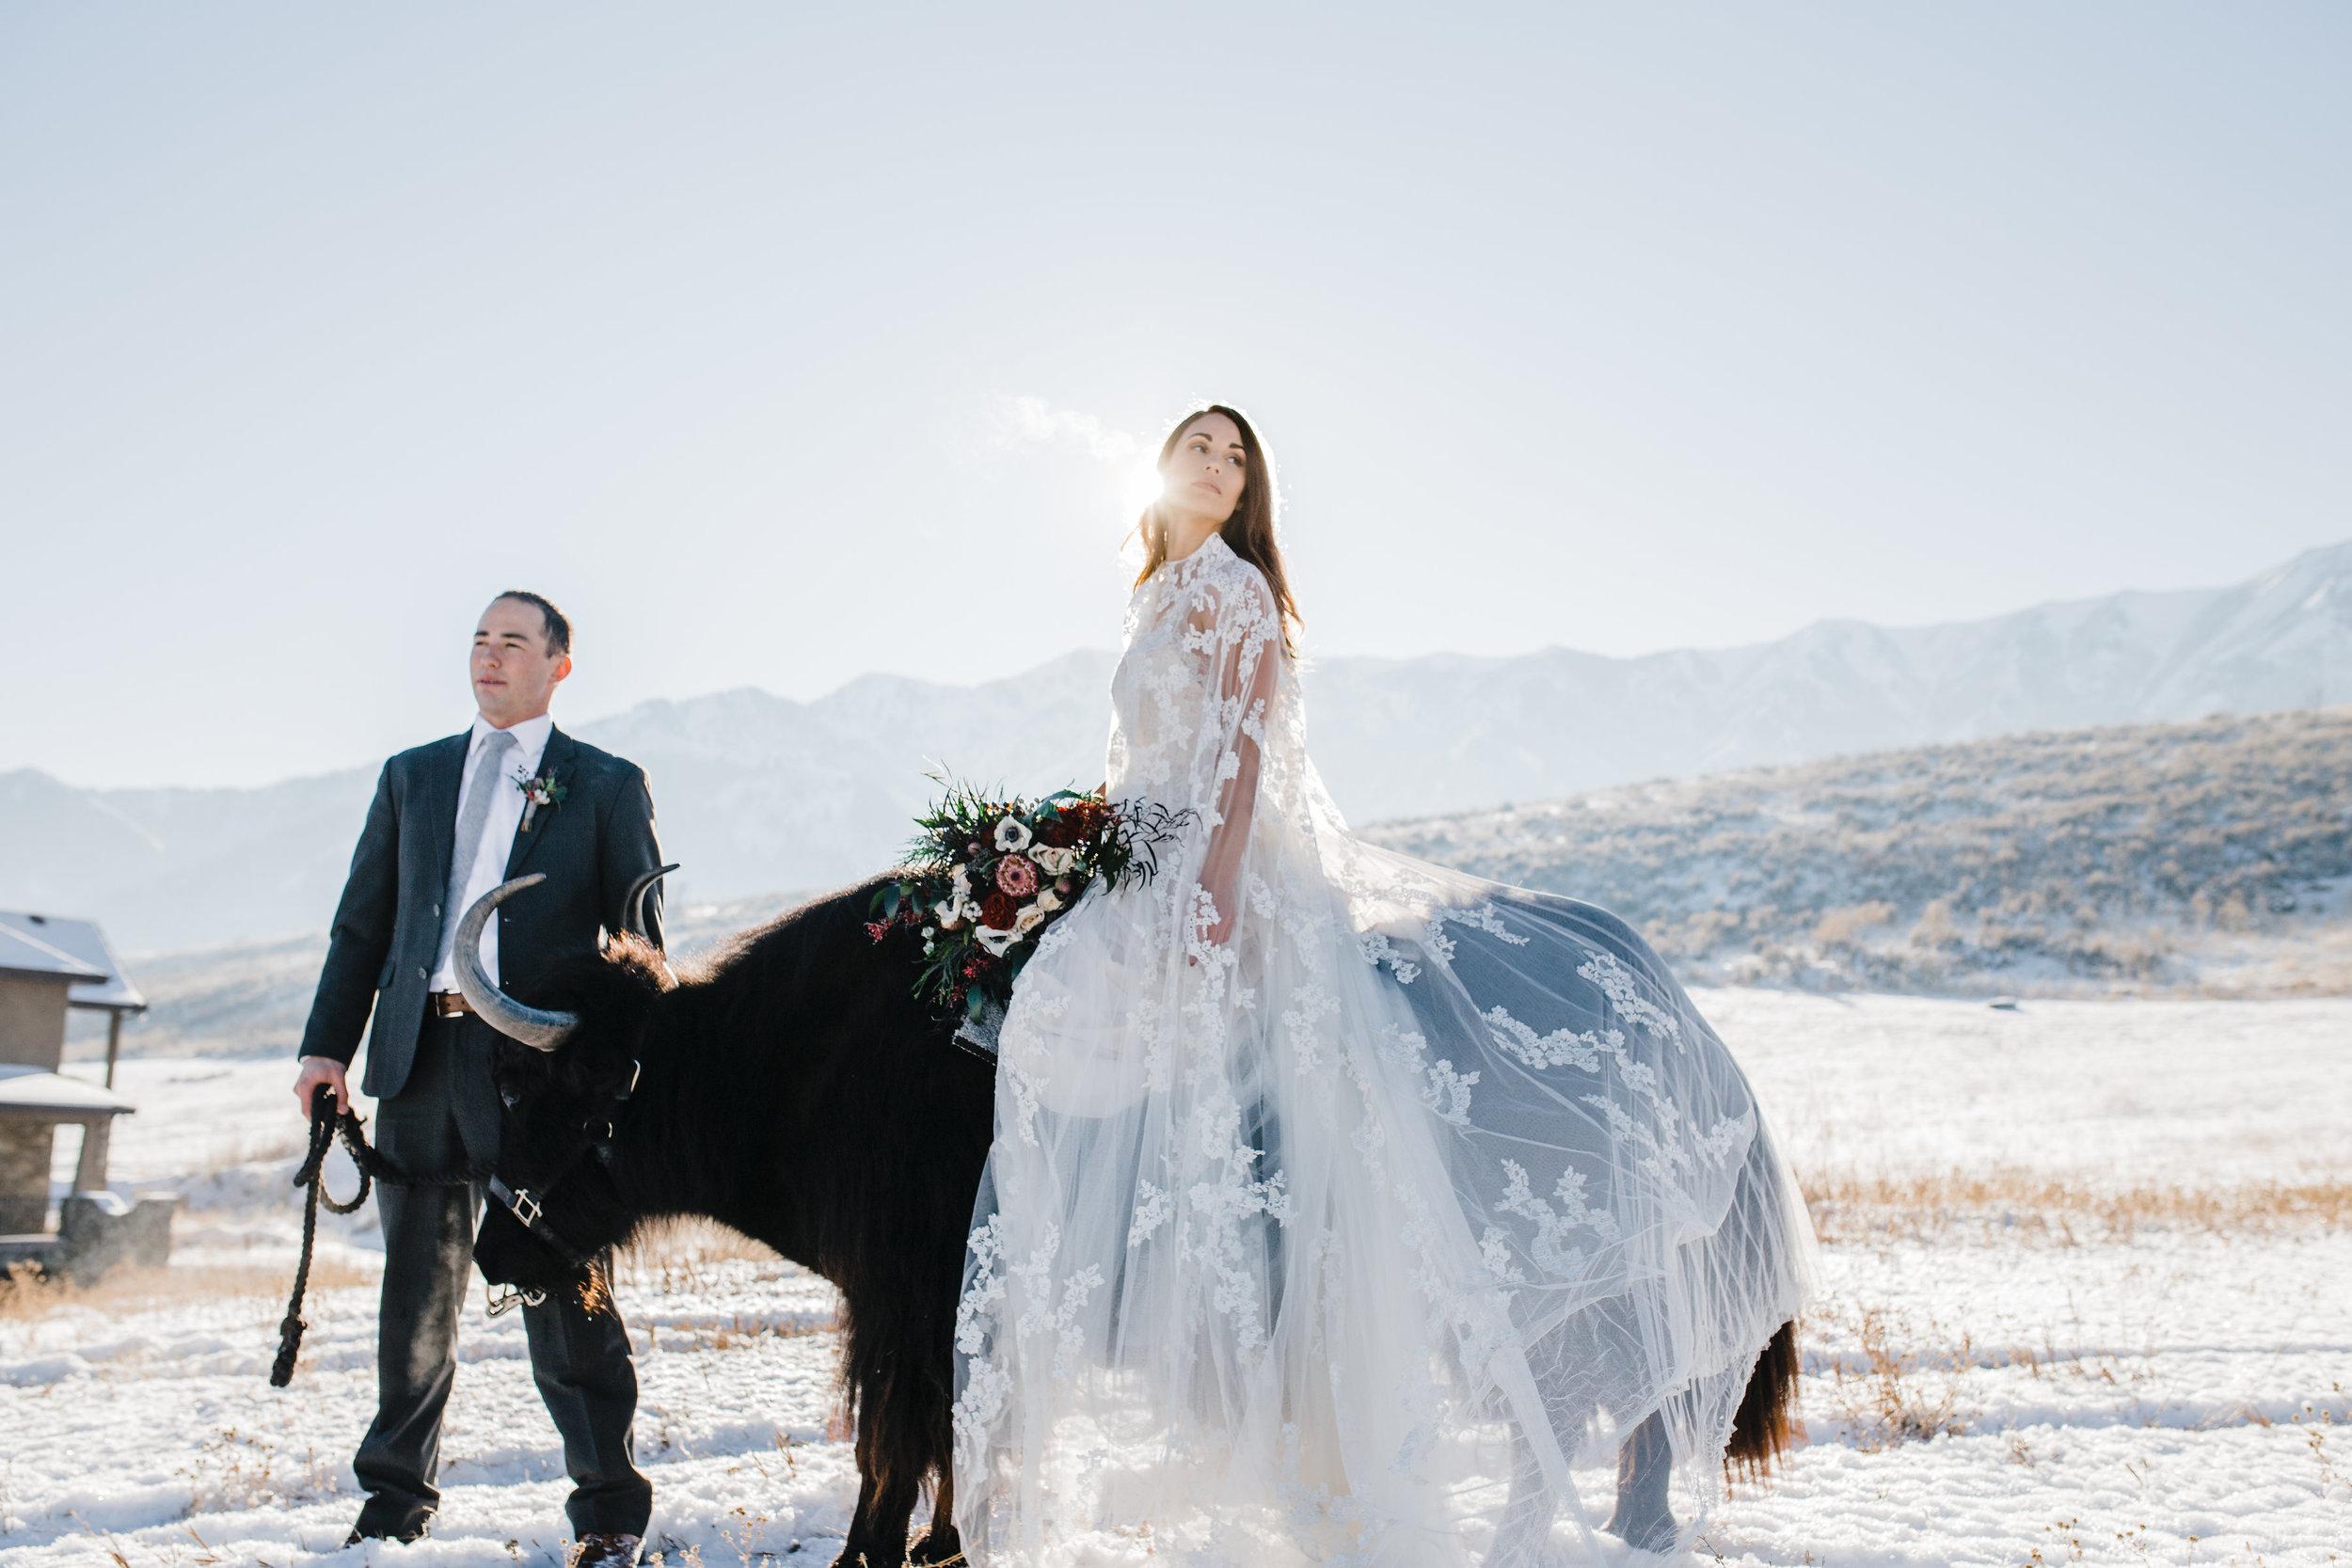 winter wedding photography yak logan utah